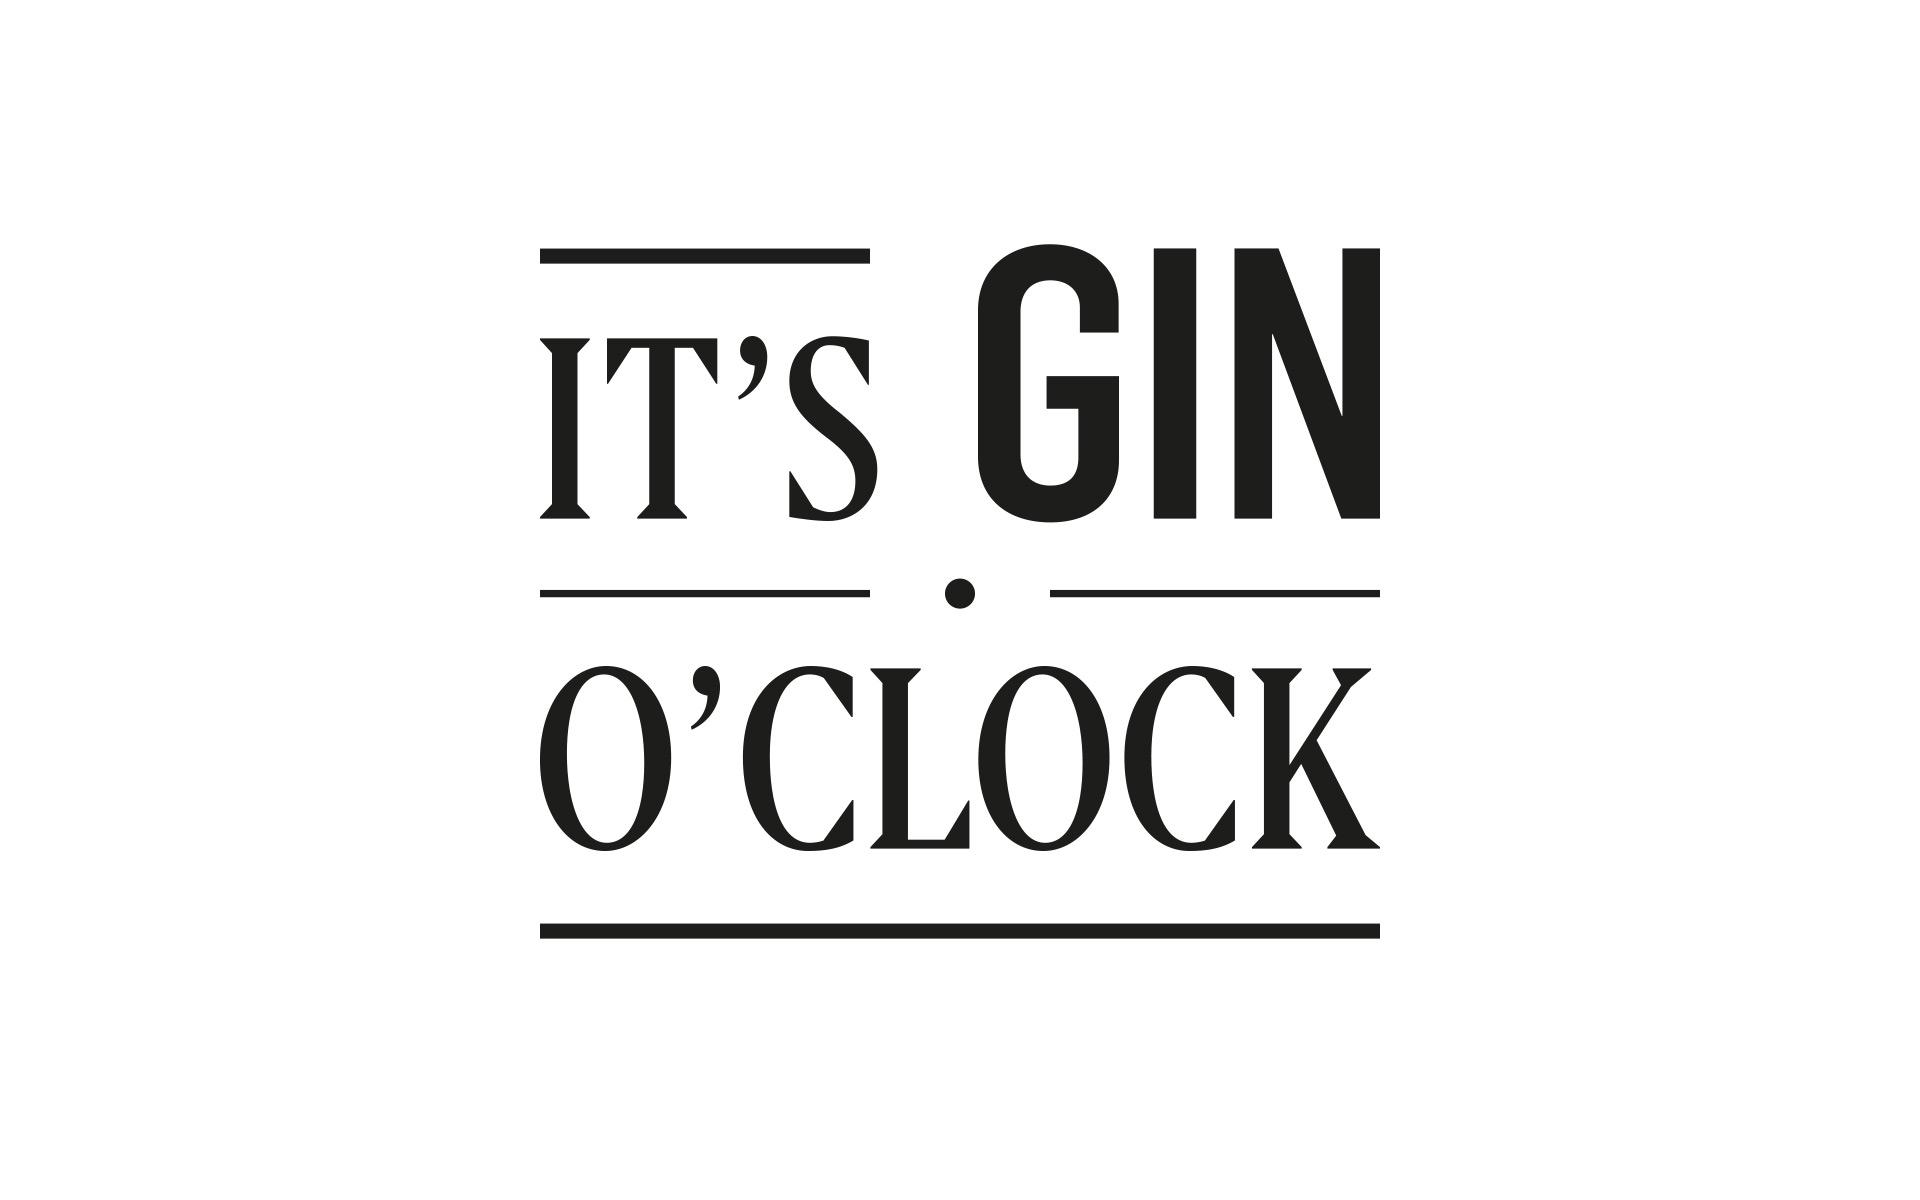 stay golden, brand identity, corporate design, design, marke, it's gin o'clock, gin, gin blog, fidentity, logo, farbwelt, designkonzept, düsseldorf, osnabrück